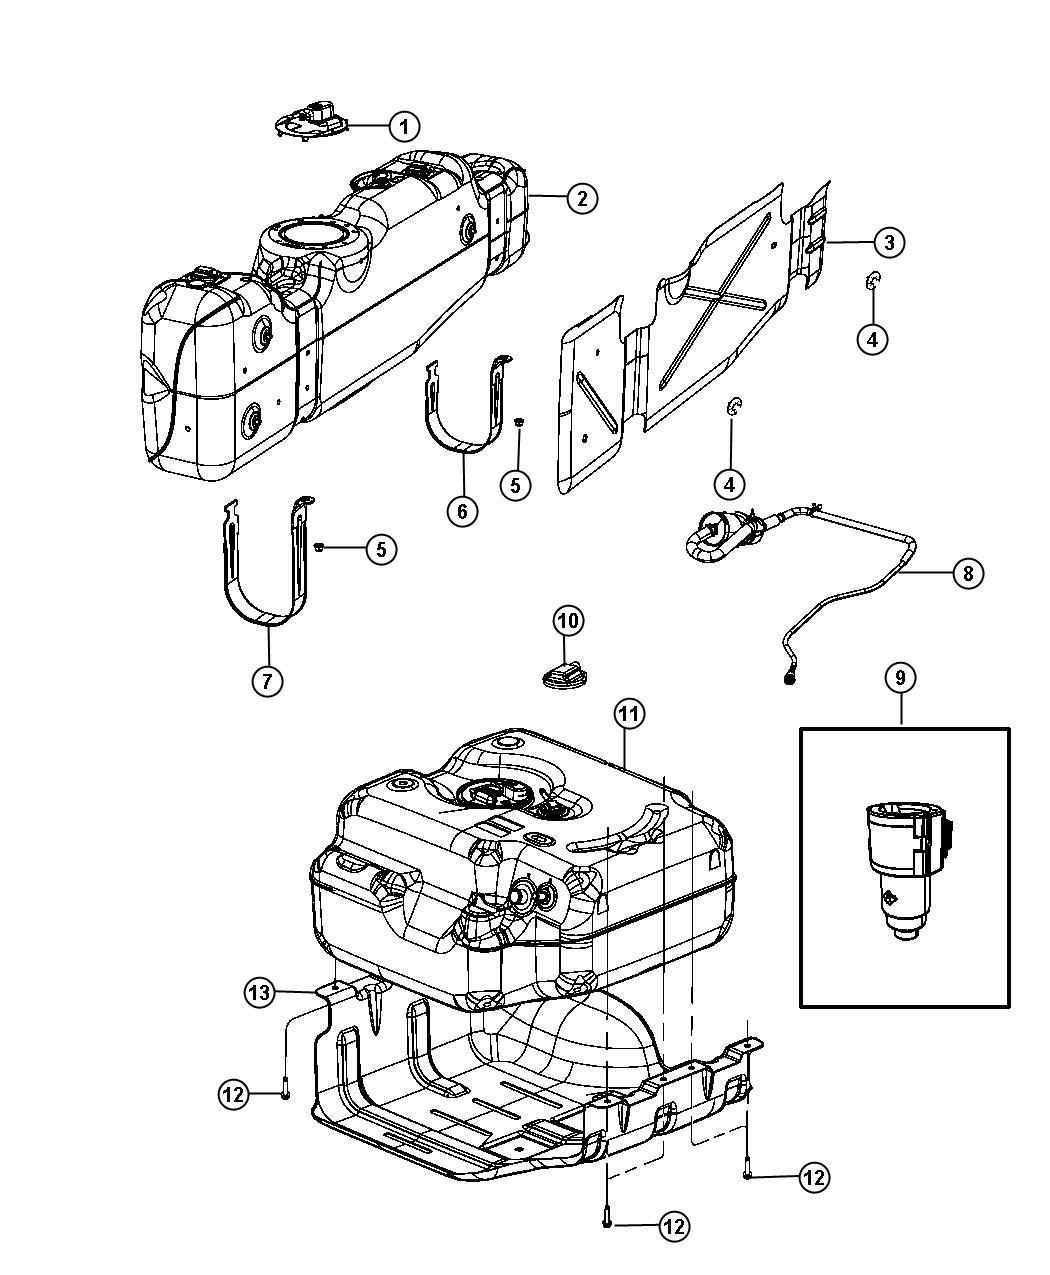 Dodge Ram Tube Fuel Vapor 52 Gallon Rear Fuel